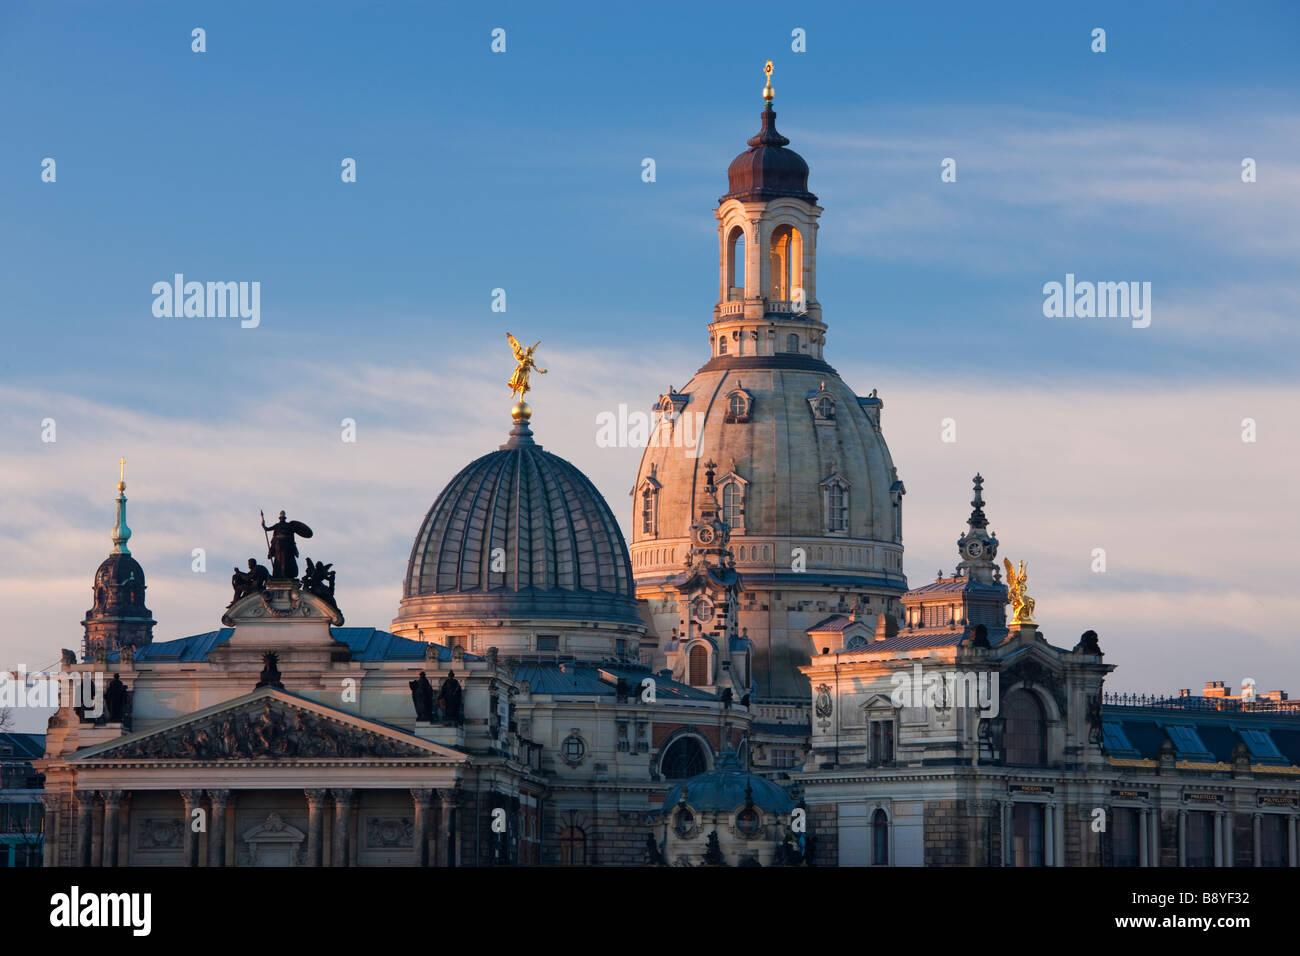 Kuppel der Frauenkirche Dresden Sachsen Deutschland Stockbild